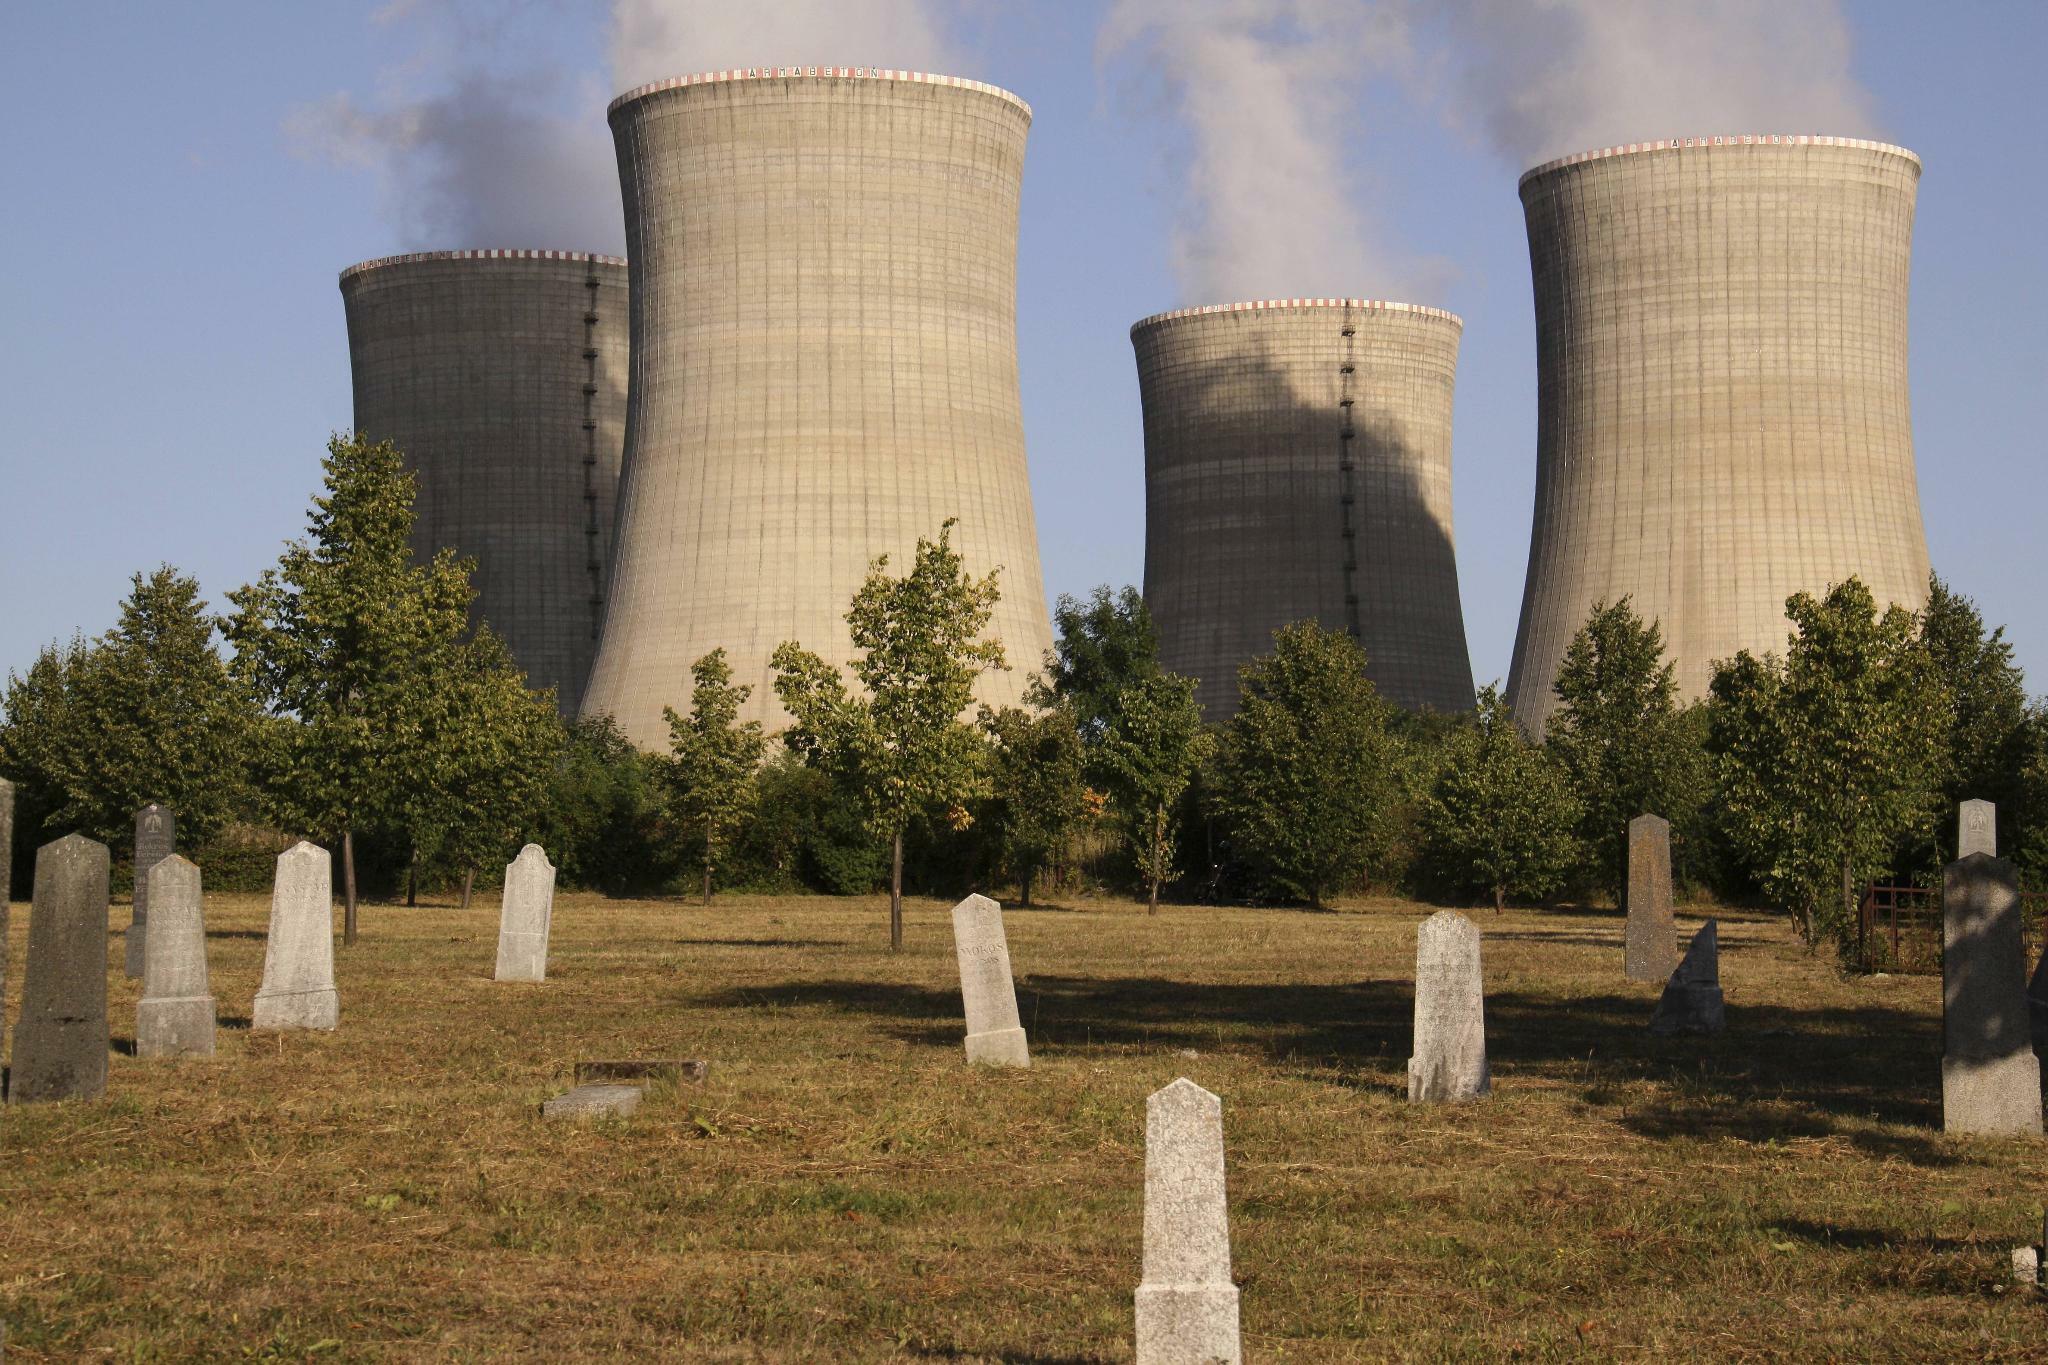 Slowakische Atomreaktoren lassen die Bundesregierung kalt